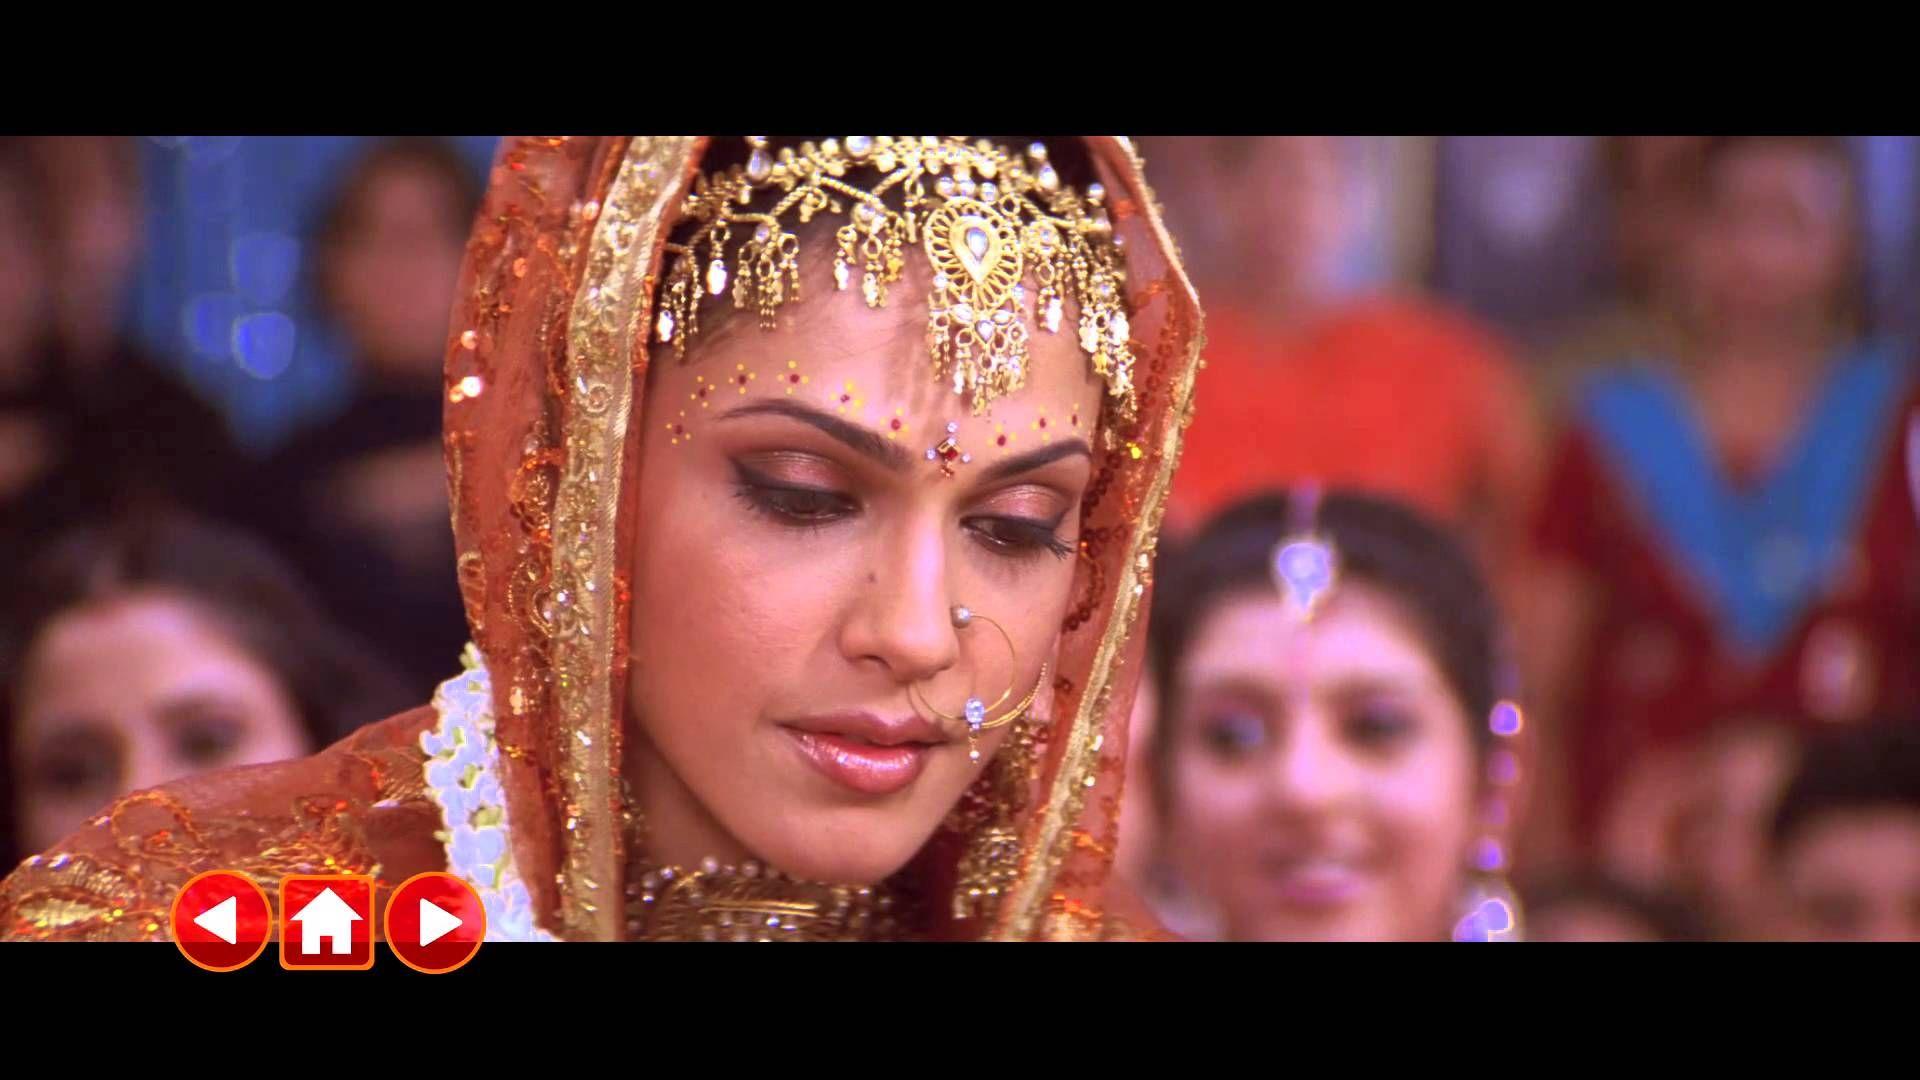 Bollywood Wedding Songs Jukebox Non Stop Hindi Shaadi Songs Romantic Wedding Songs Bollywood Wedding Wedding